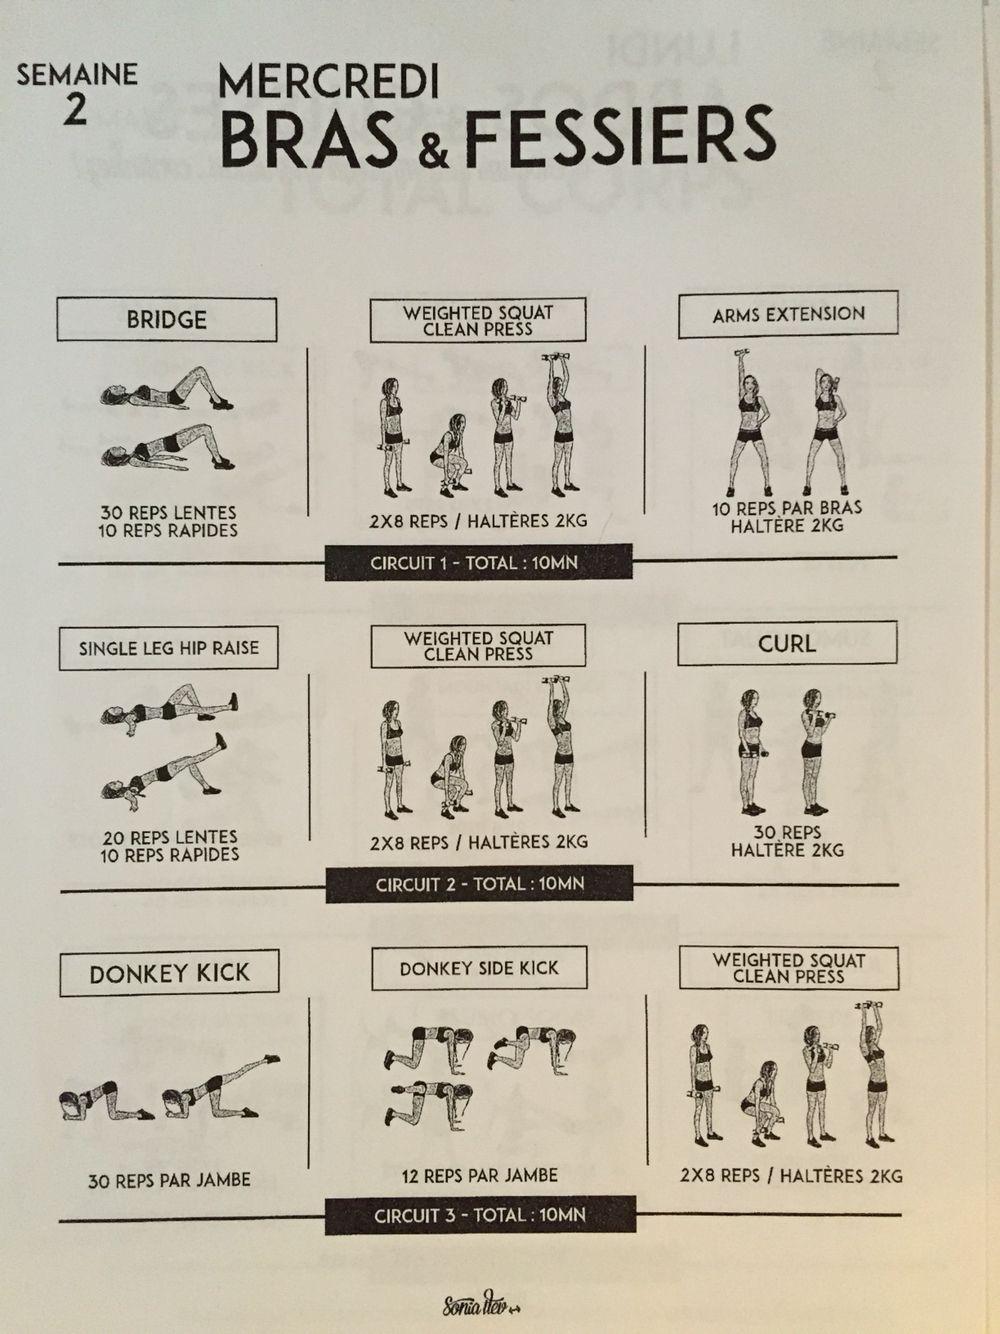 Fabuleux TBC Semaine 2 - Mercredi 22:55 min | Get fit! | Pinterest | Bodies  OO54